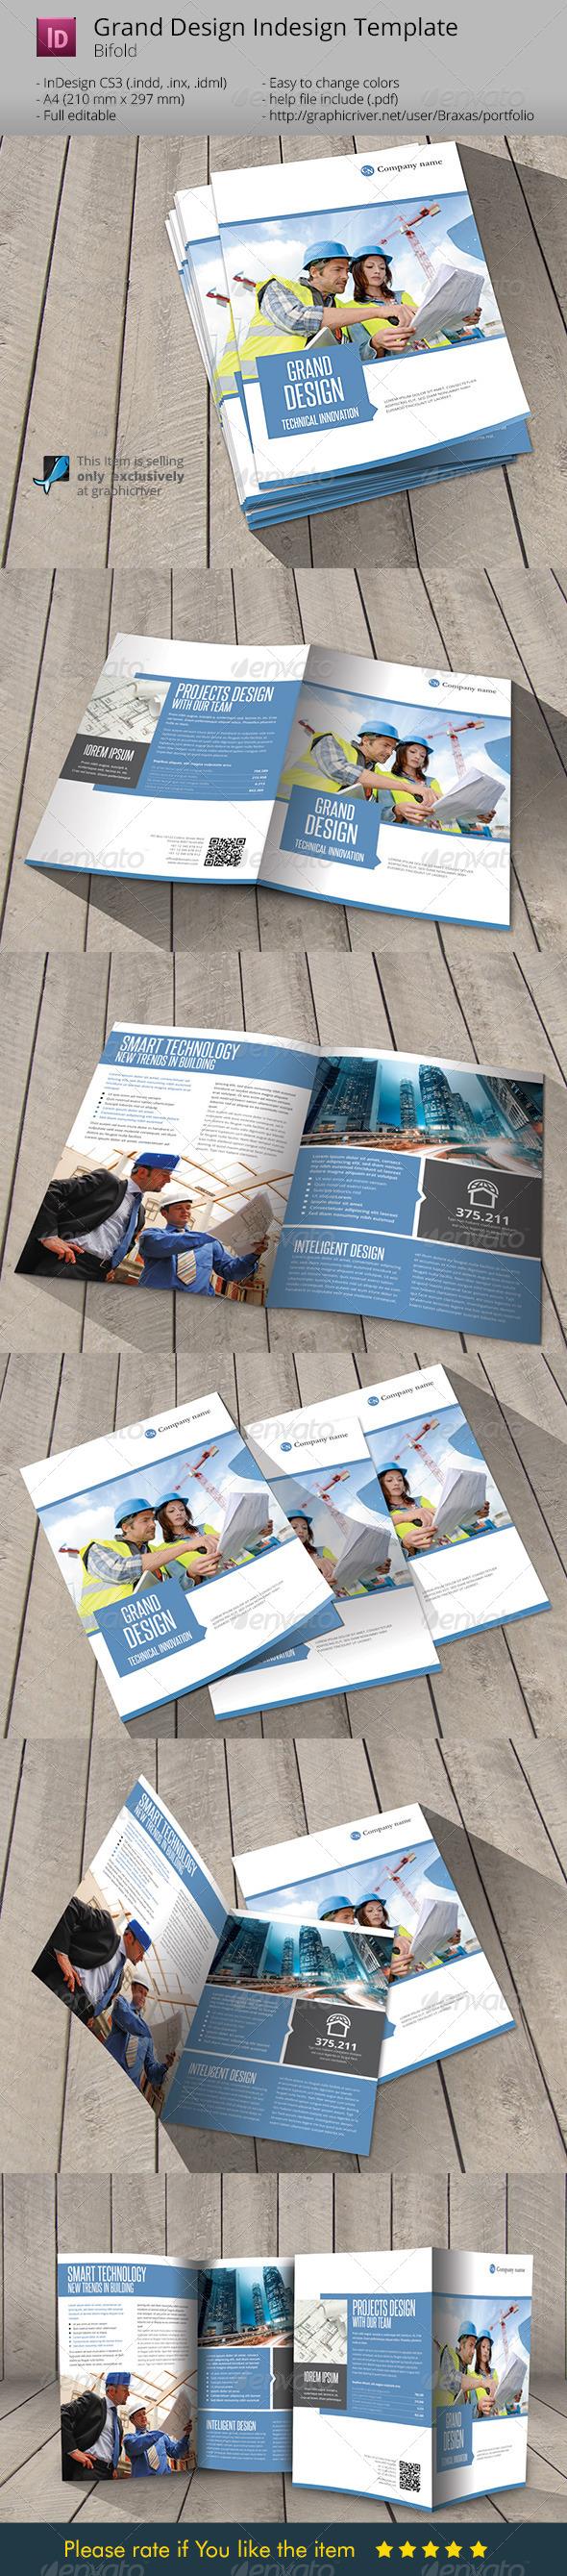 GraphicRiver Grand Design Indesign Template Brochure 6234476